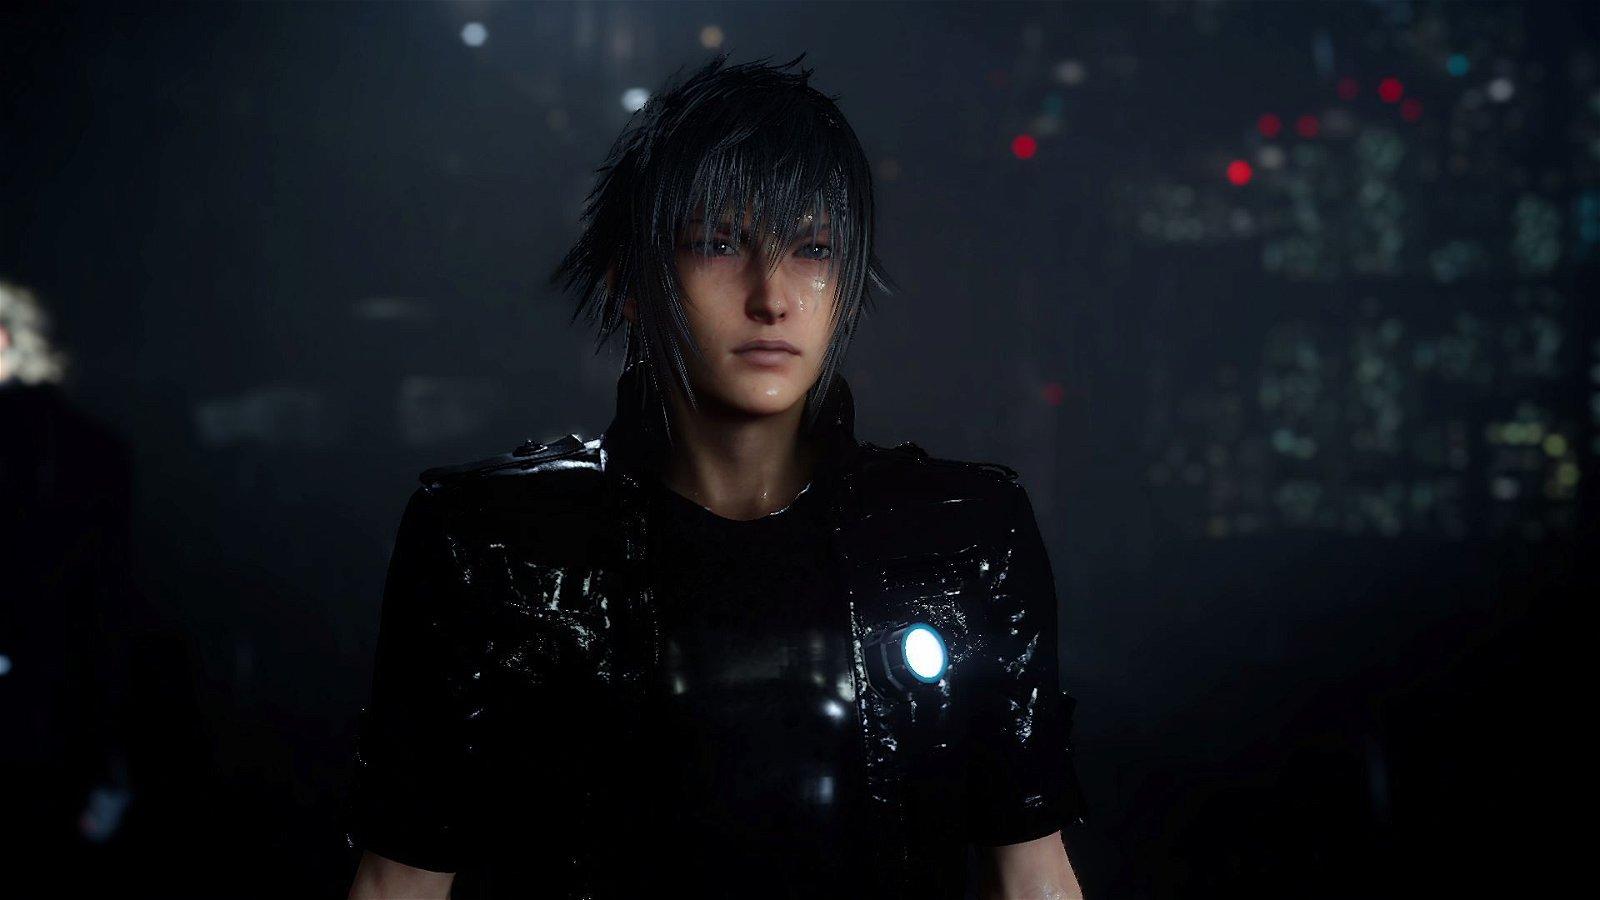 Final Fantasy Xv News Roundup 1